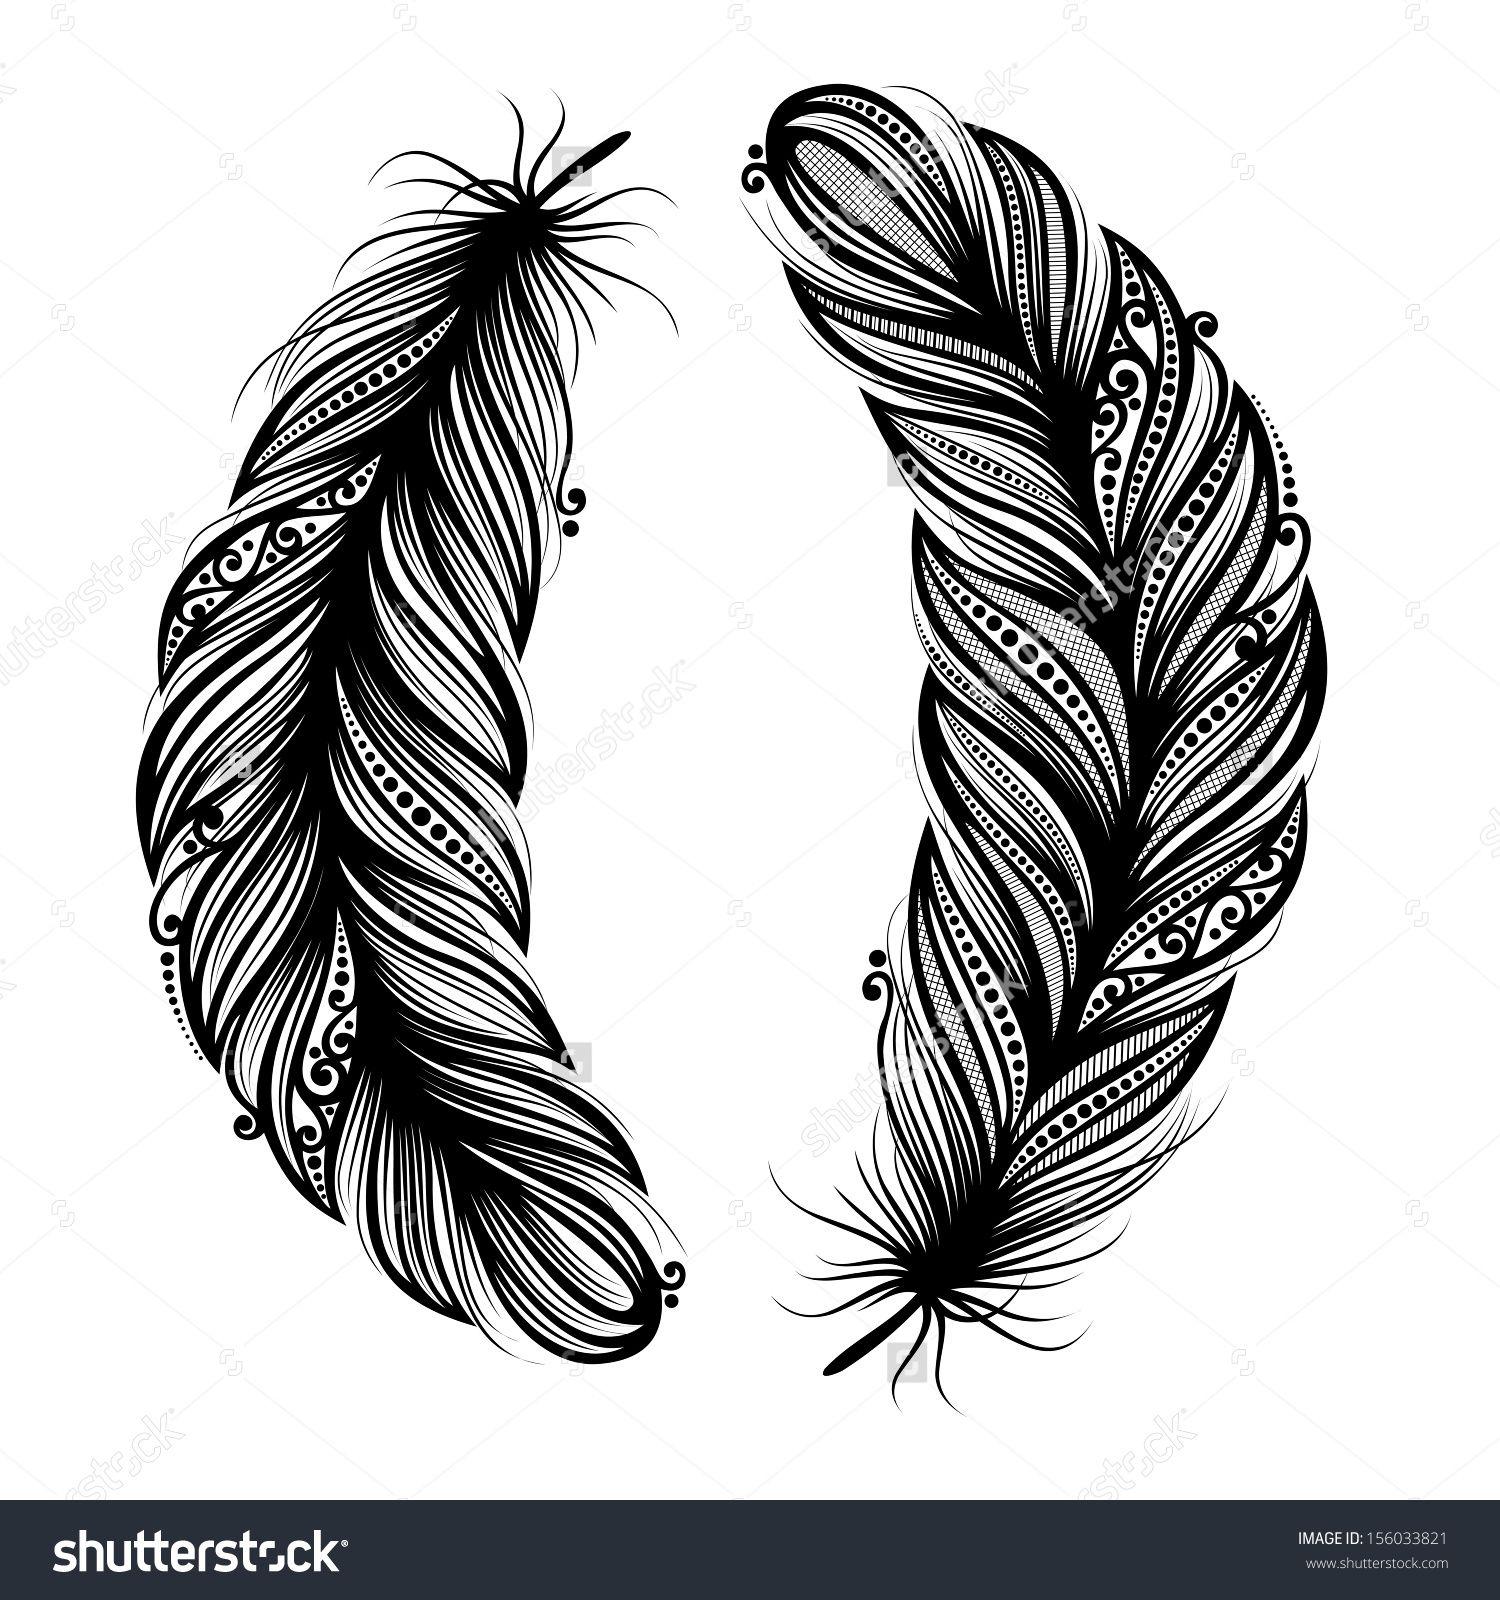 peerless decorative feather vector patterned design tattoo shutterstock inspira o b. Black Bedroom Furniture Sets. Home Design Ideas